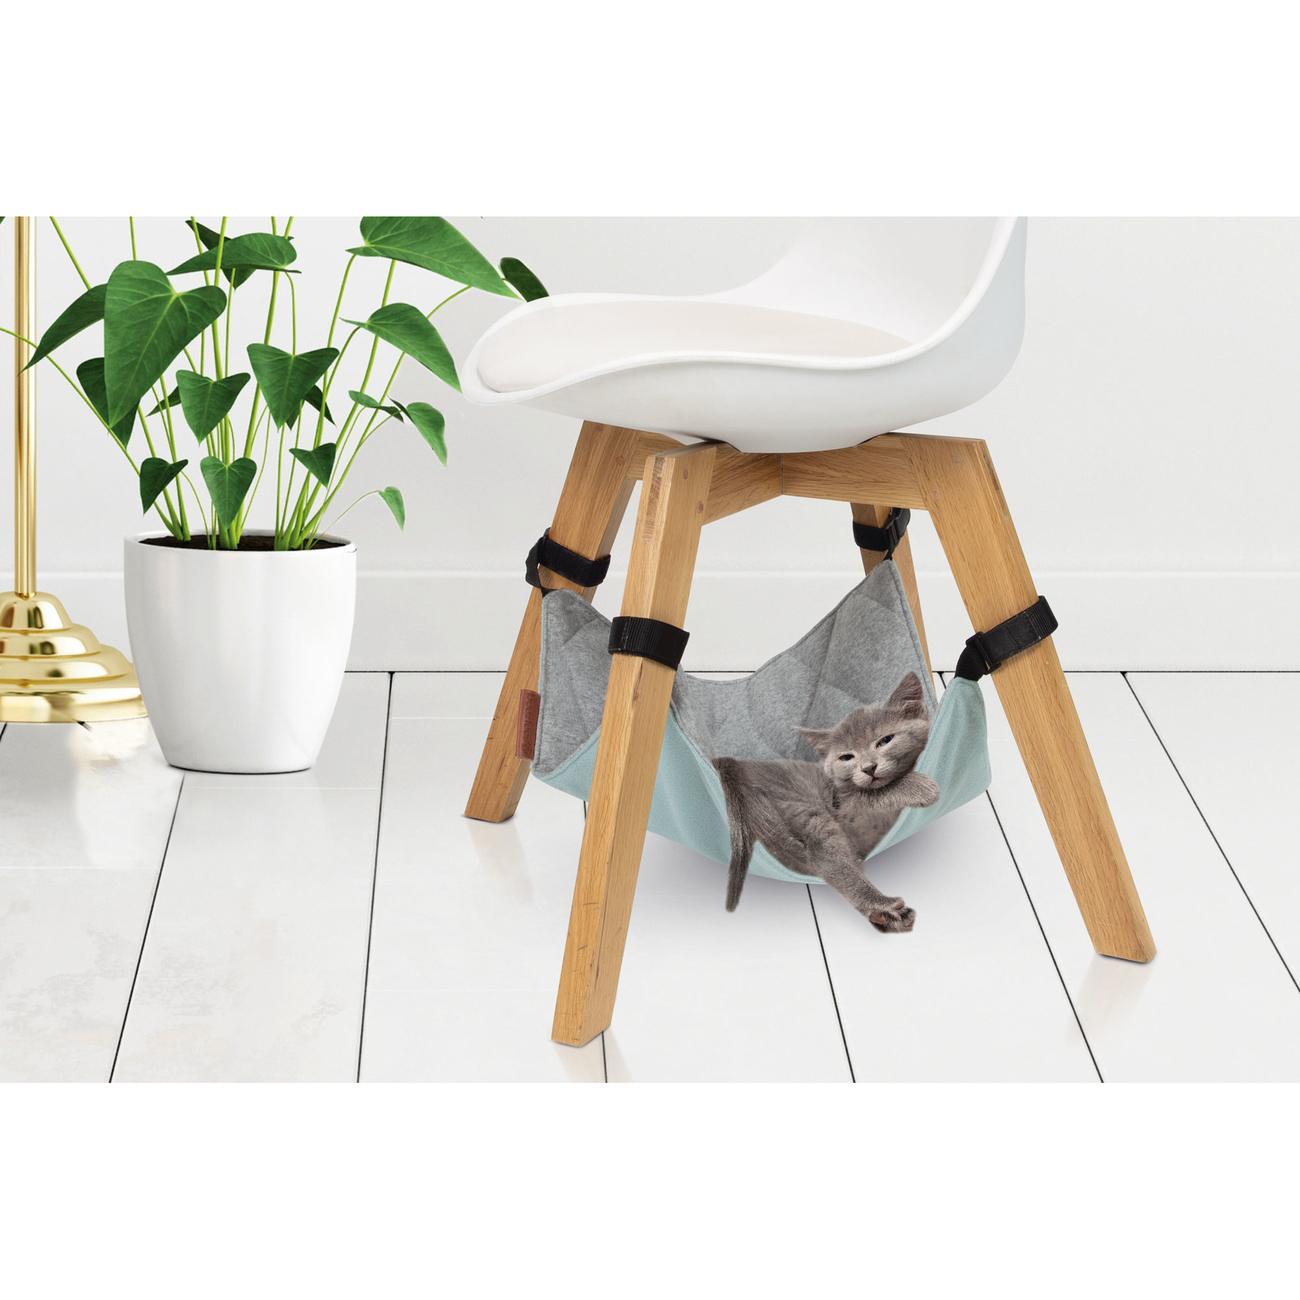 Beeztees Katzen Hängematte Loungy, 40 x 40 x 1 cm, grau